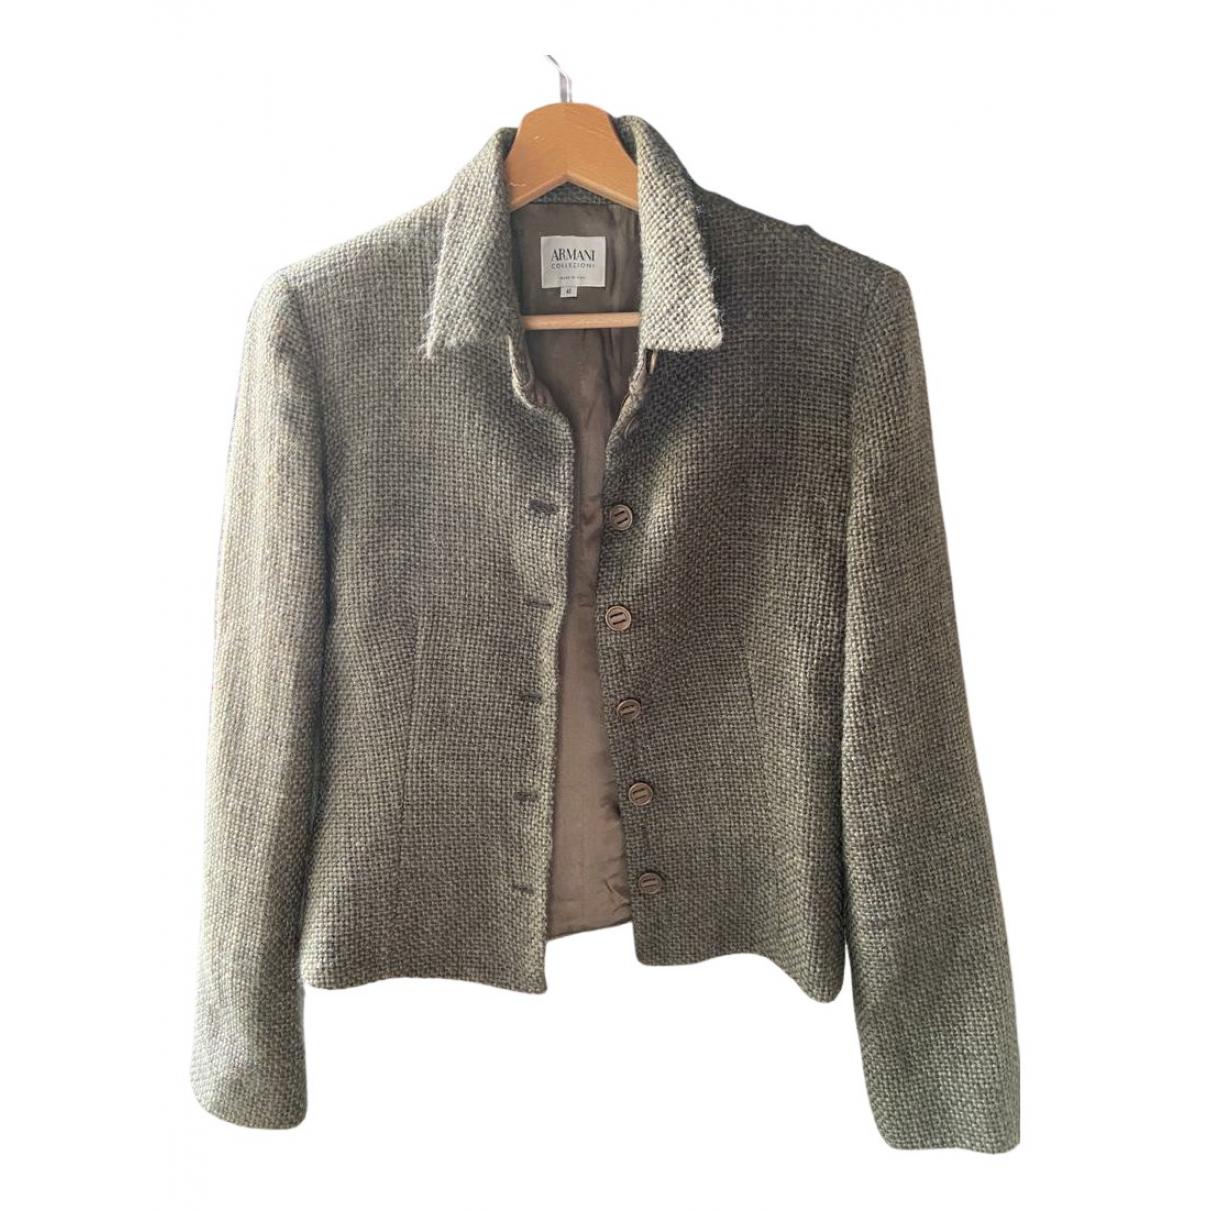 Armani Collezioni \N Jacke in  Gruen Wolle